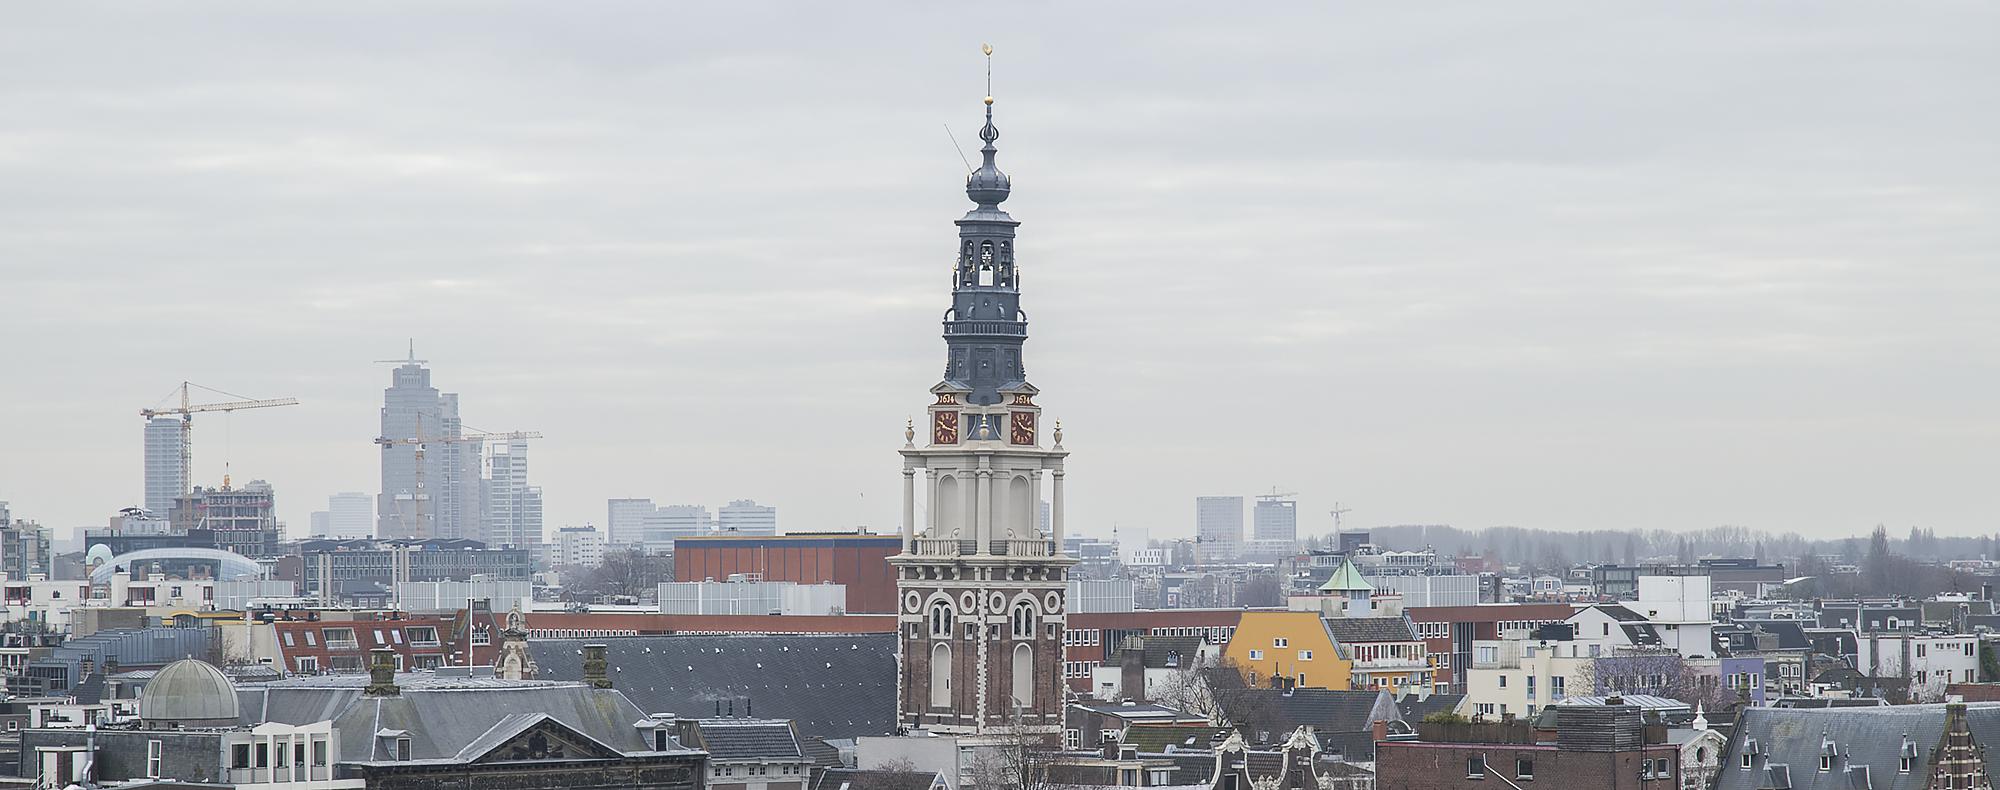 Zuiderkerktoren Amsterdam | Monumentenfotograaf Leontine Lamers